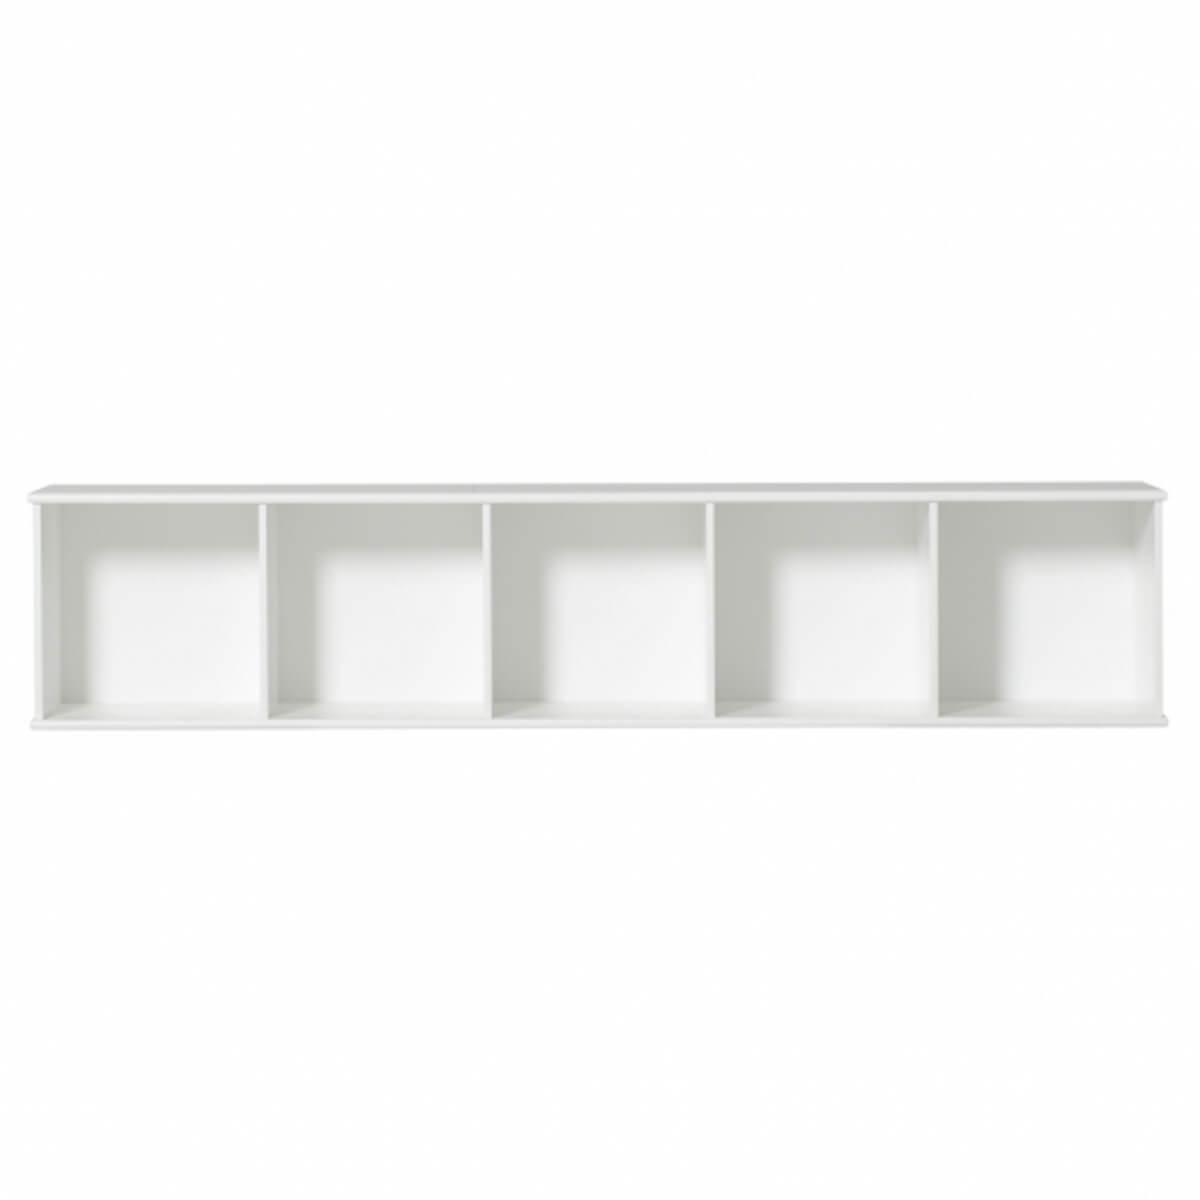 Estantería 174x43cm WOOD Oliver Furniture blanco